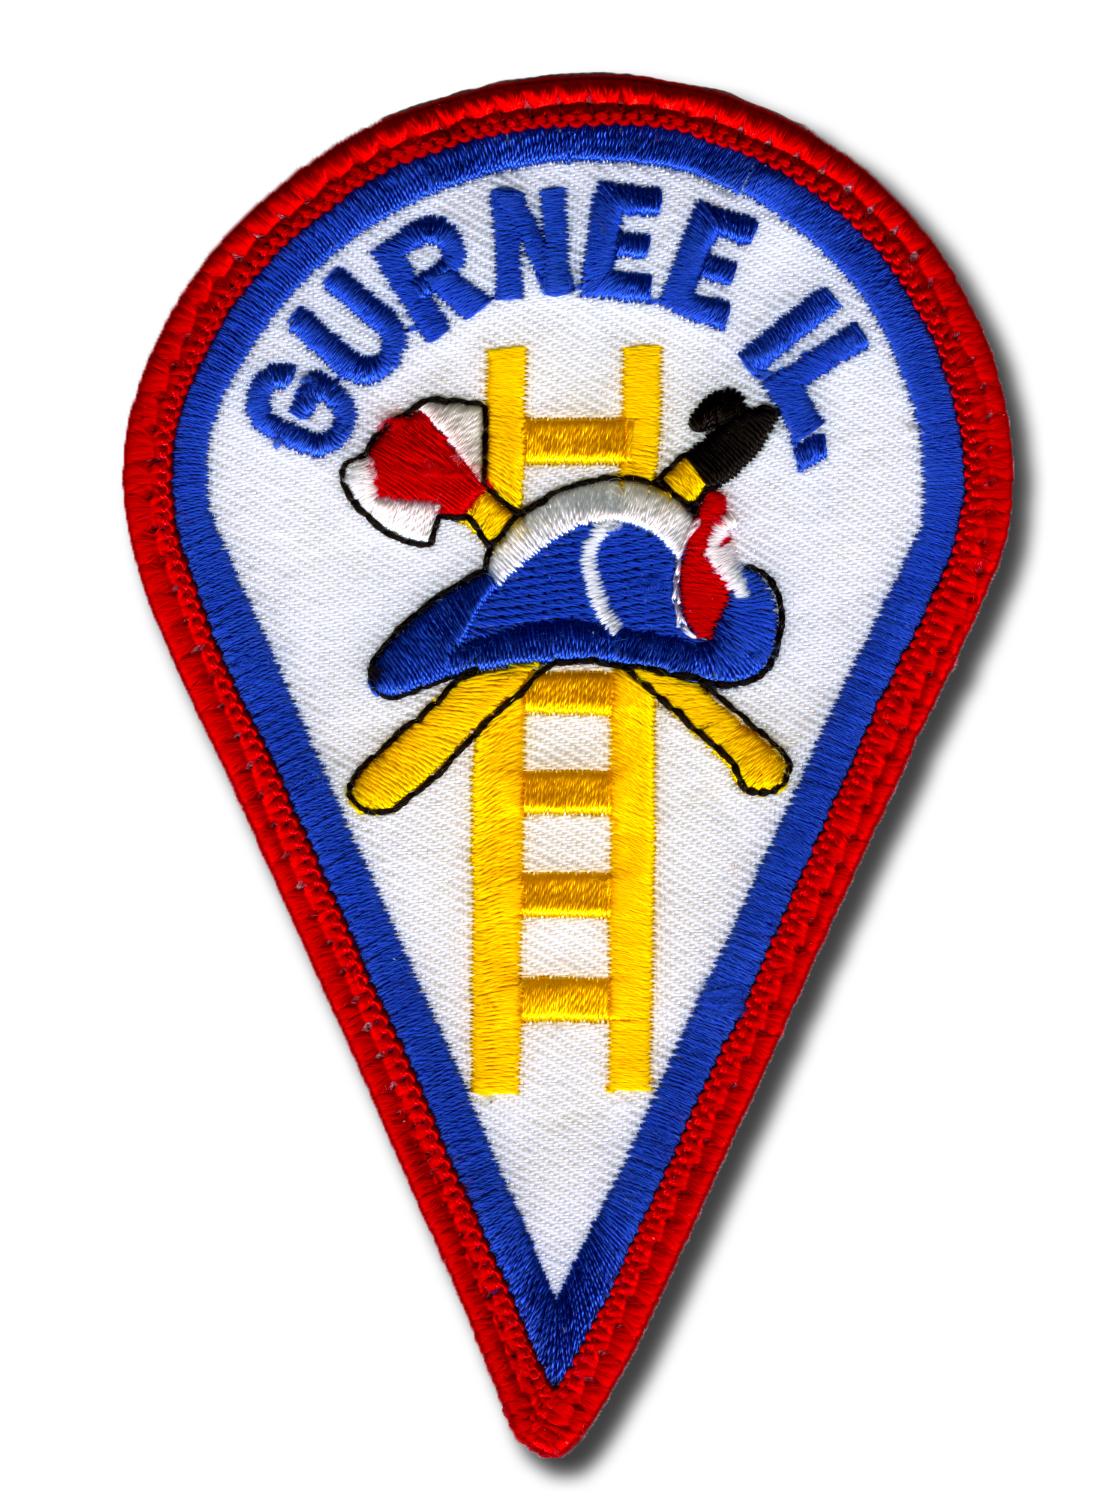 Gurnee FD patch